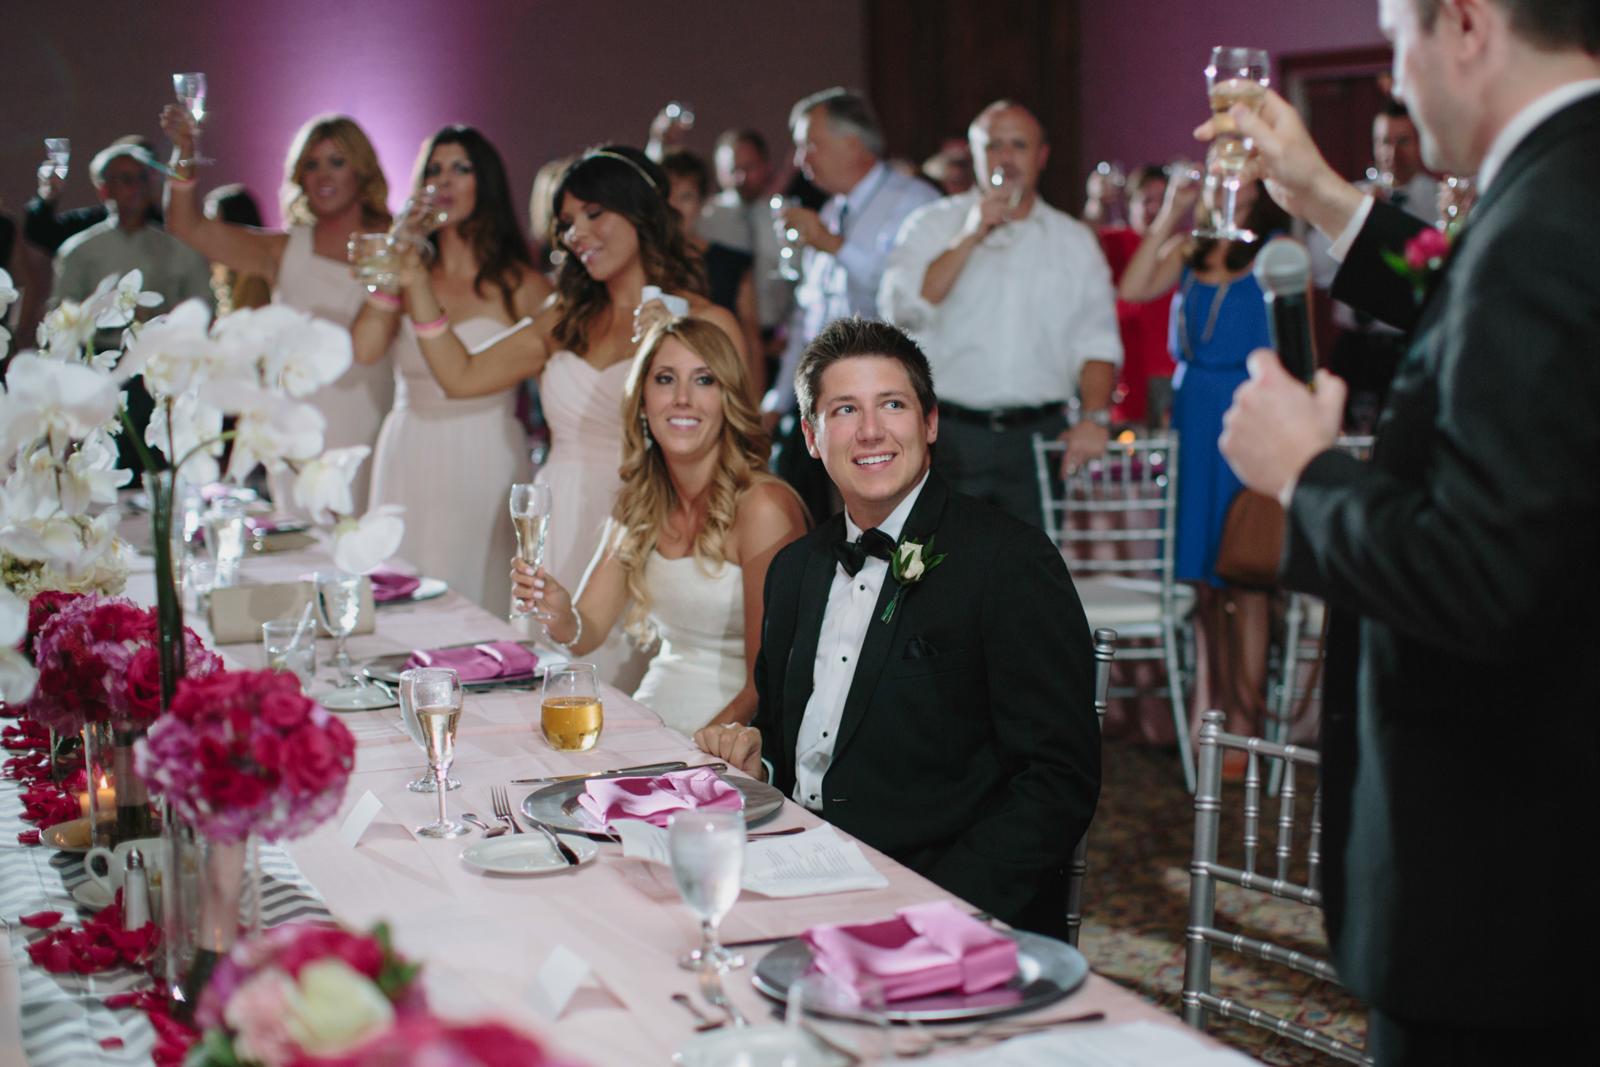 Northern Michigan Grand Traverse Resort Black Tie Wedding Photographer - Codee and Aaron-021.jpg